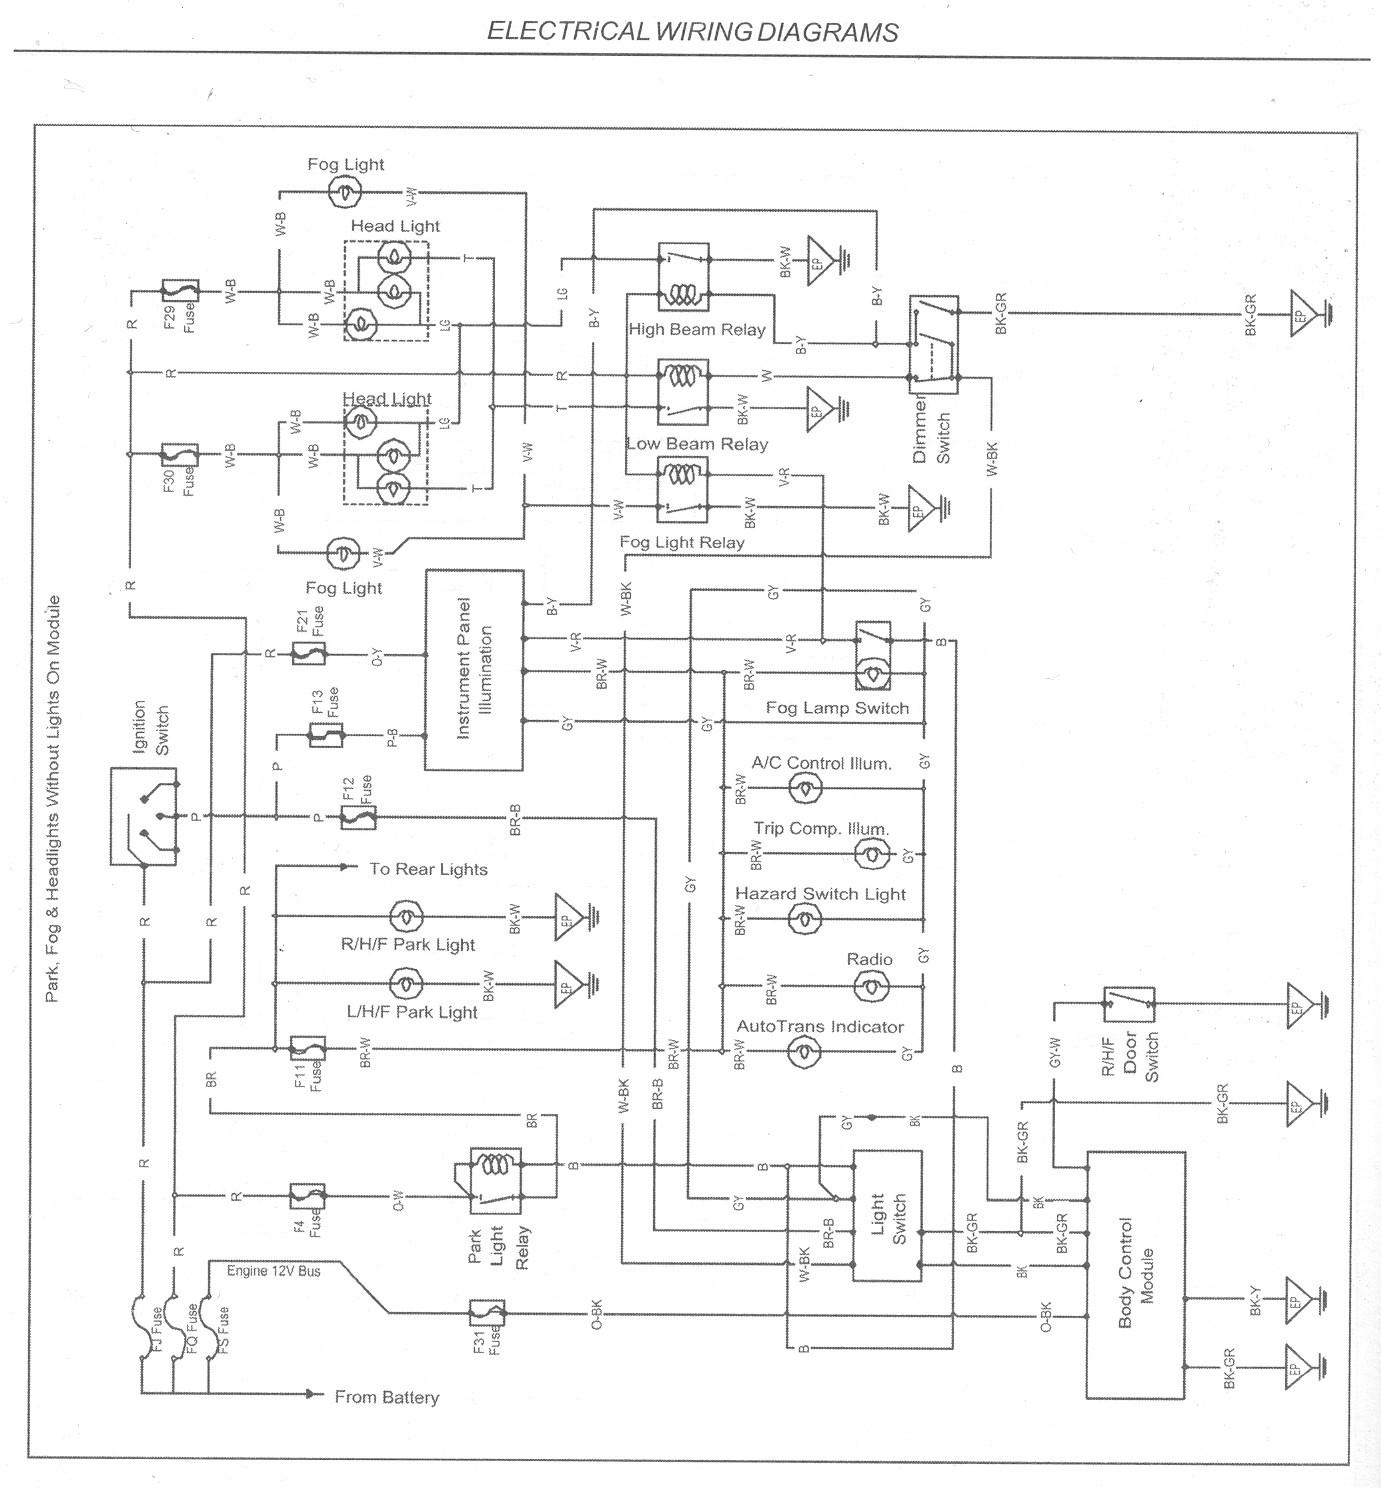 Vn Commodore Stoplight Wiring Diagram Diagram] K3 Ve Wiring Diagram Full Version Hd Quality Wiring Of Vn Commodore Stoplight Wiring Diagram